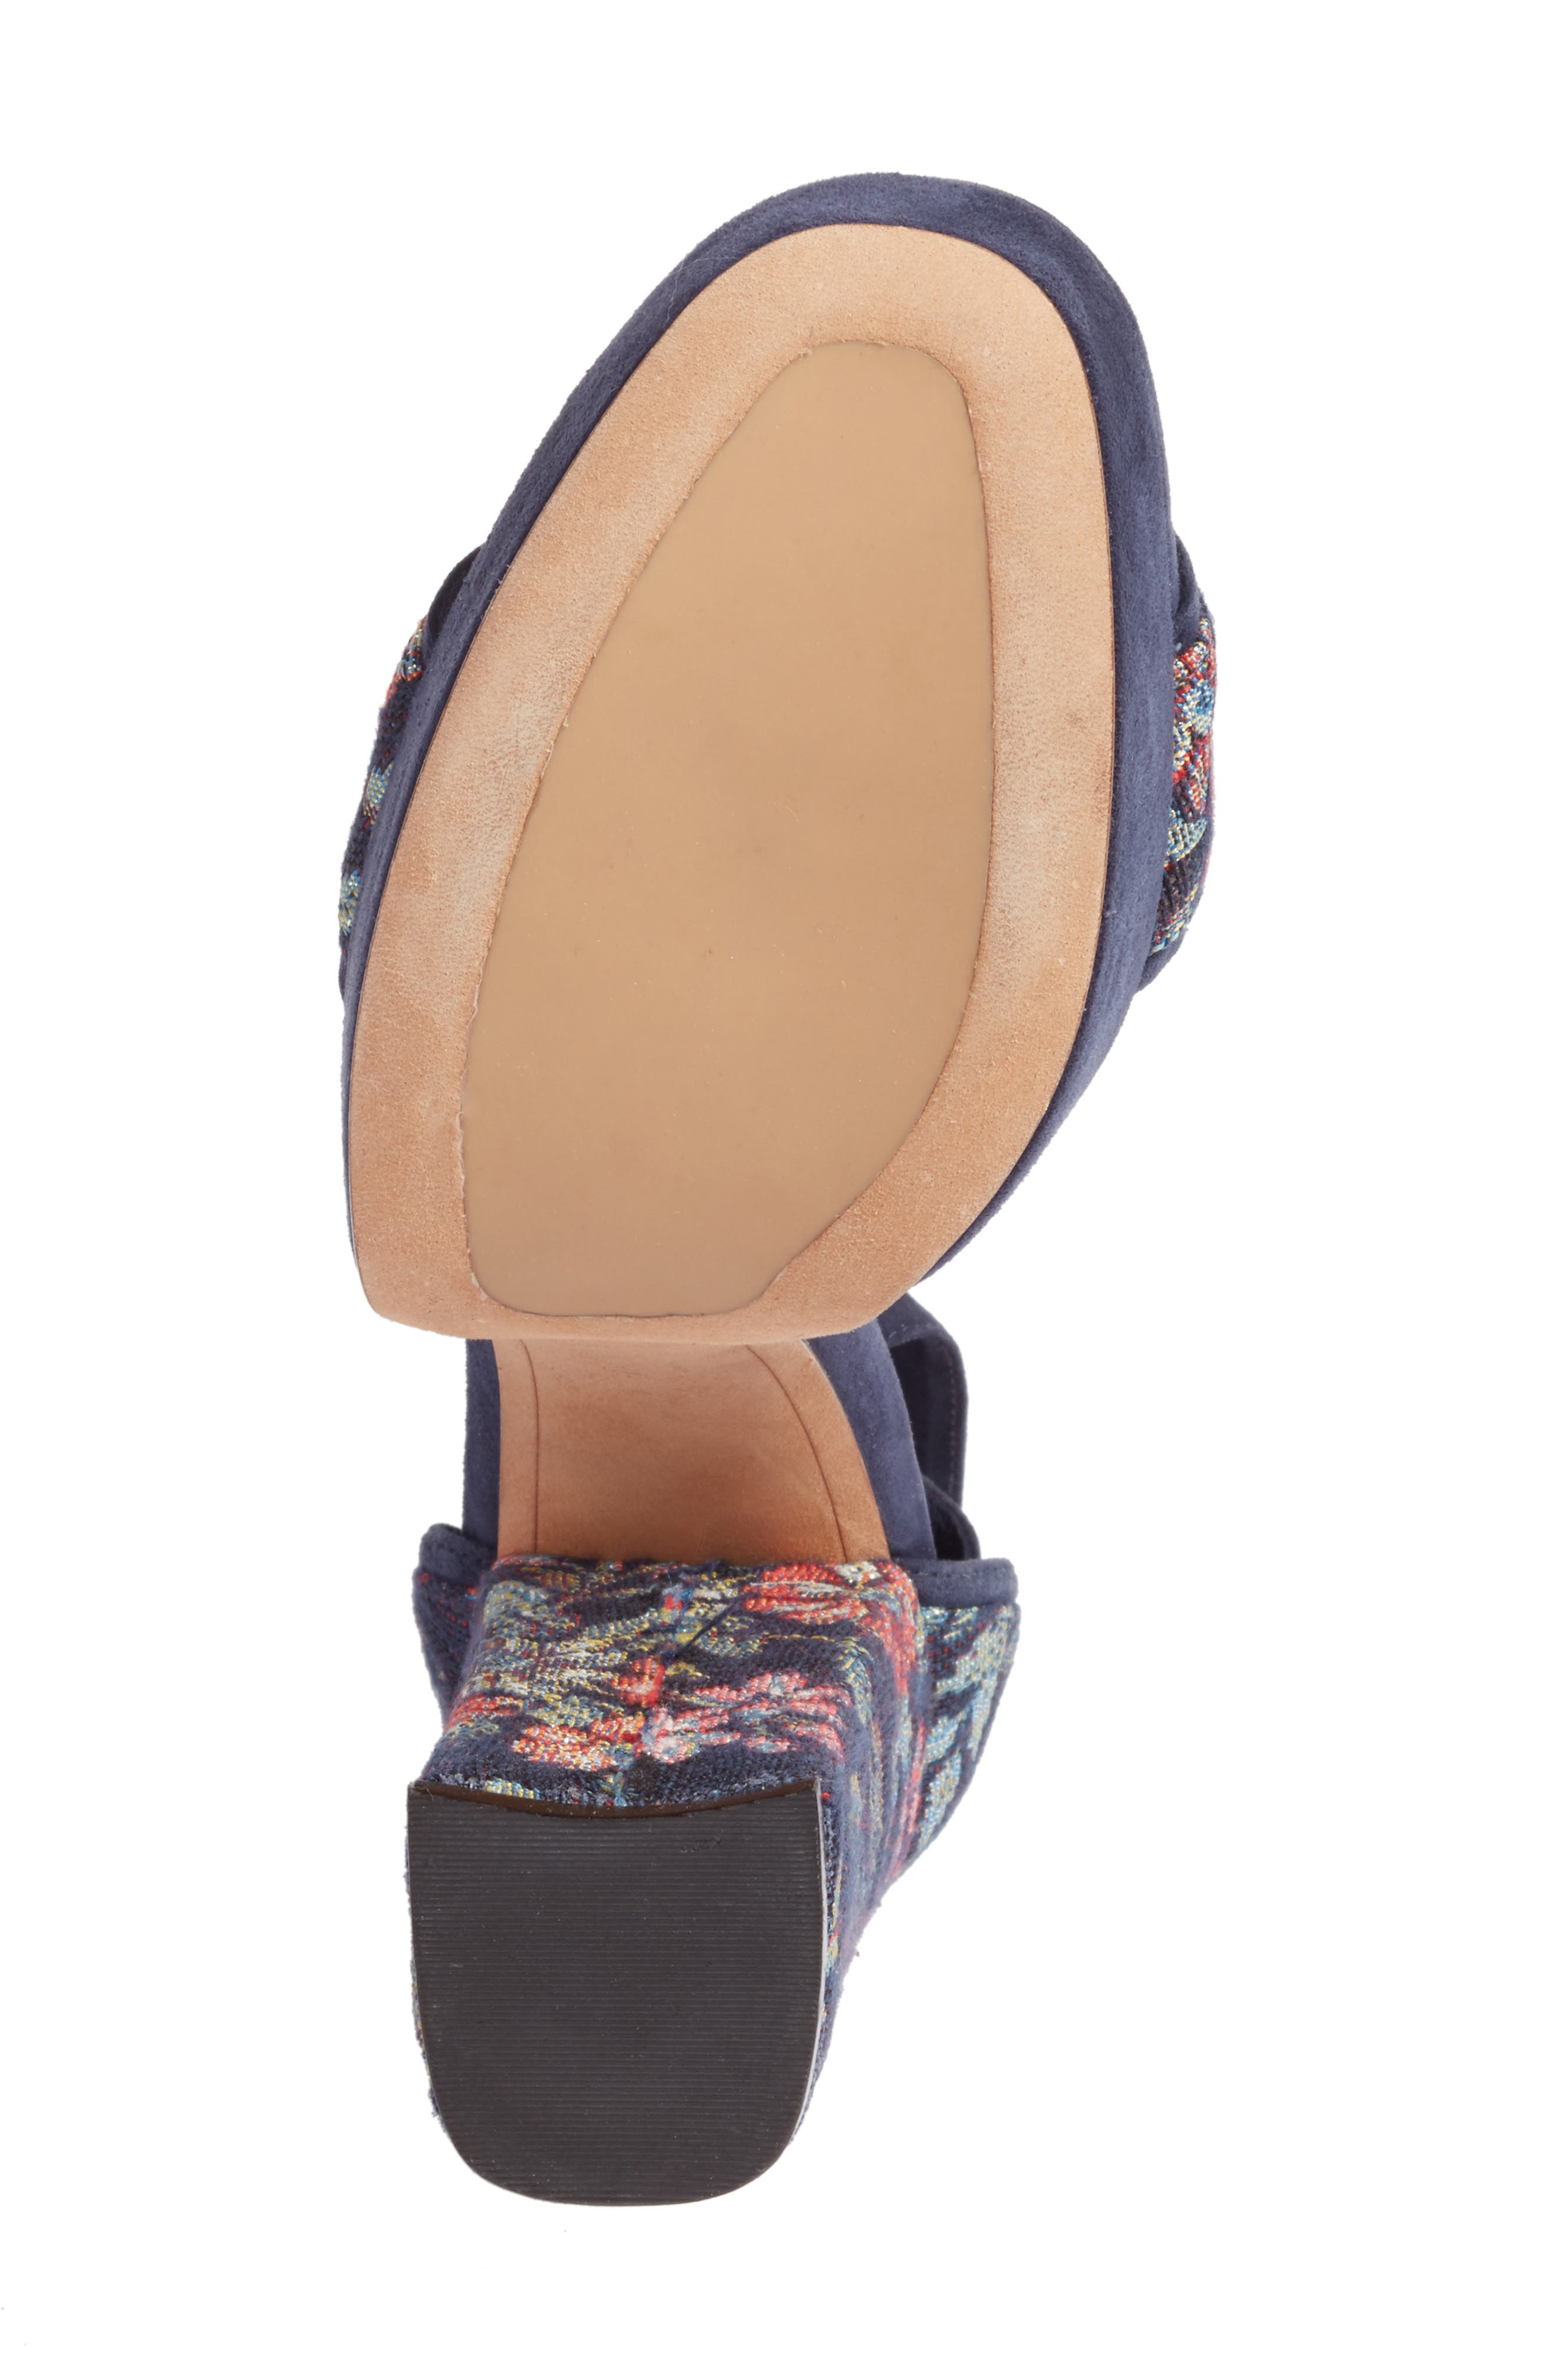 Celine Platform Sandal,                             Alternate thumbnail 11, color,